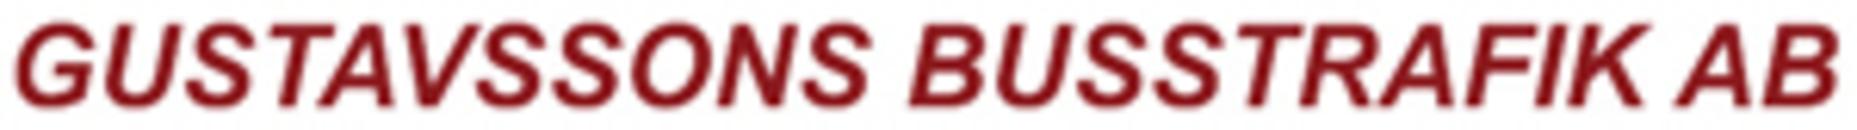 Gustavssons Busstrafik AB logo